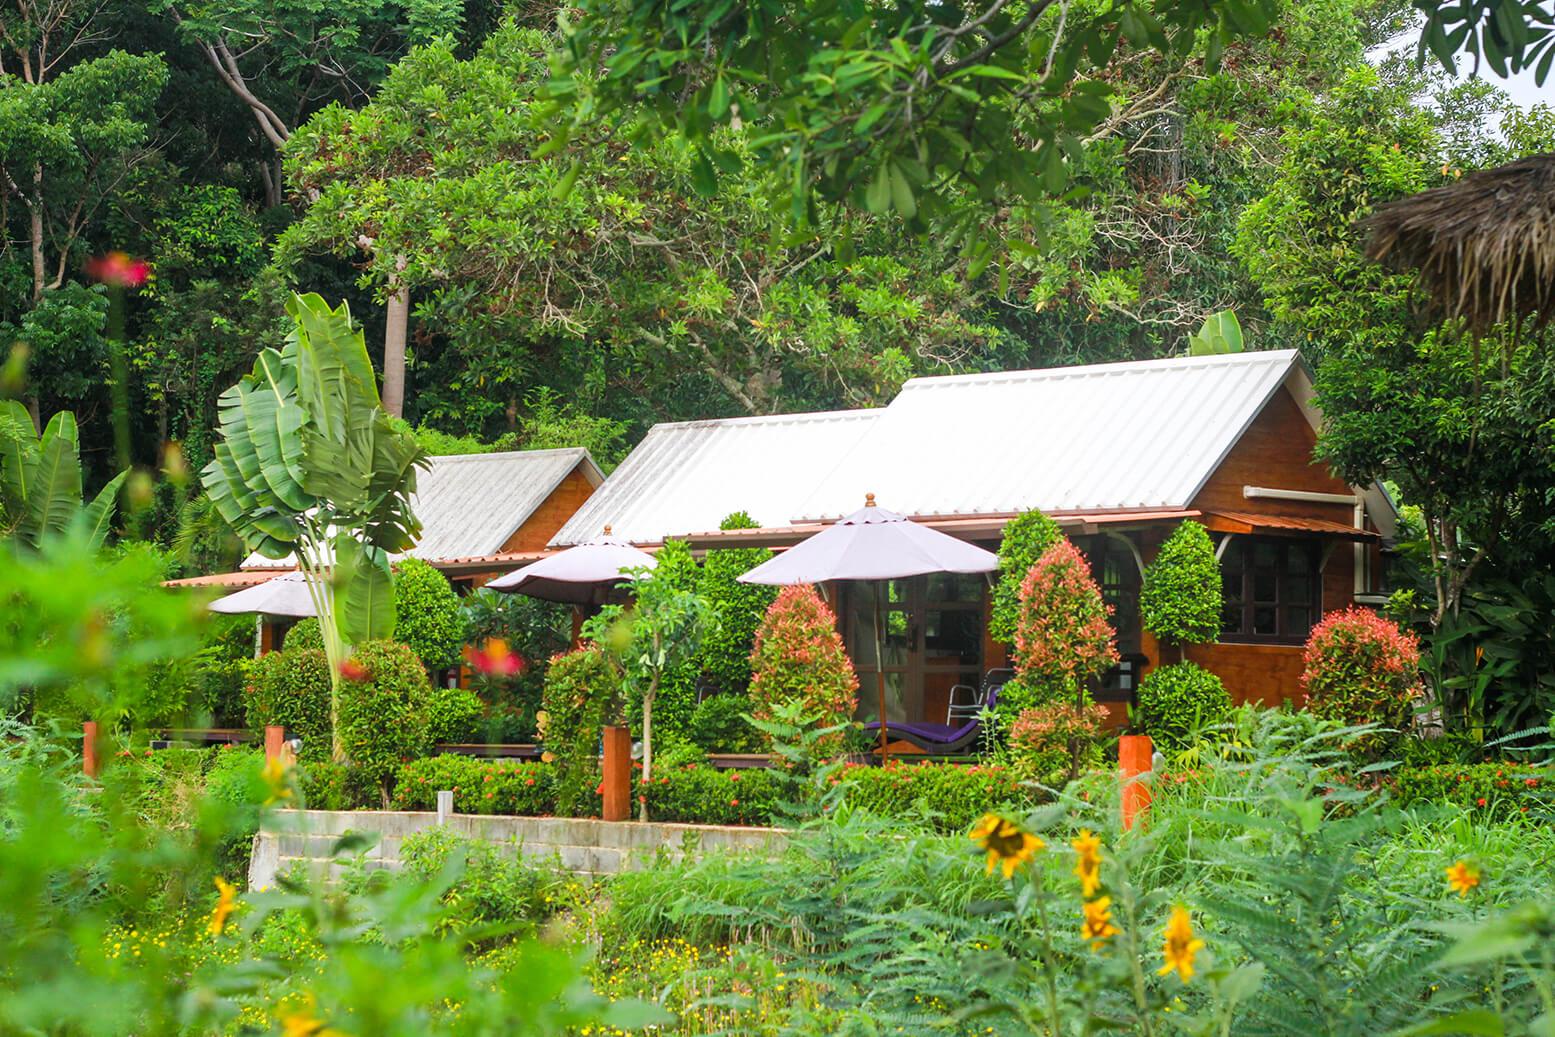 Atsumi lakeside cottage 2 (1)